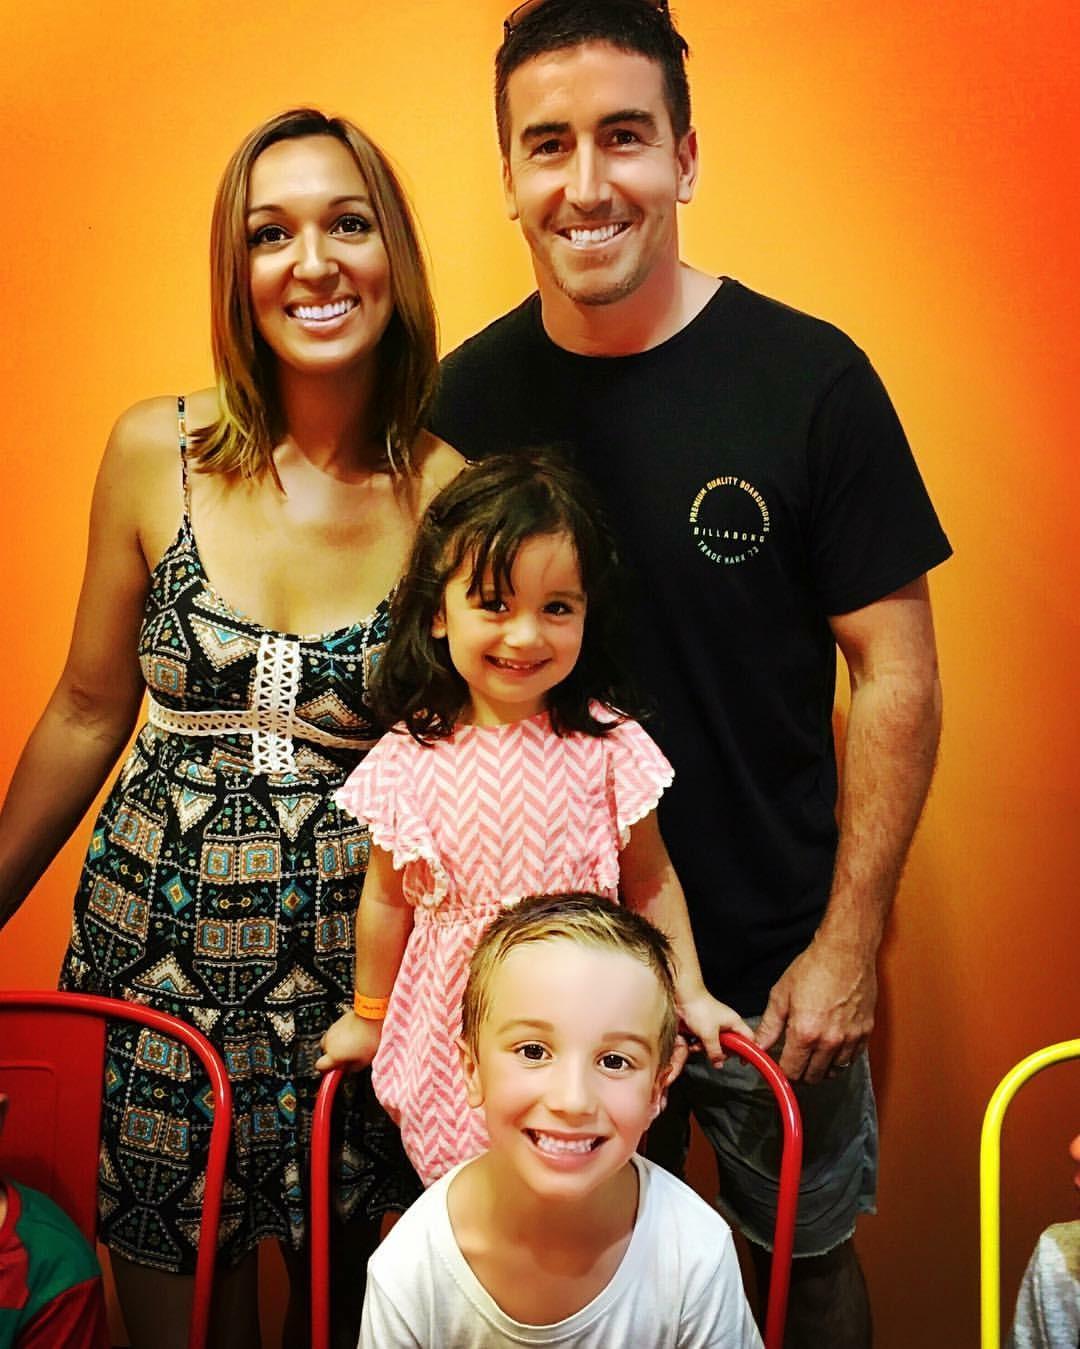 Brendo and His beautiful family. MERRY XMAS CREW